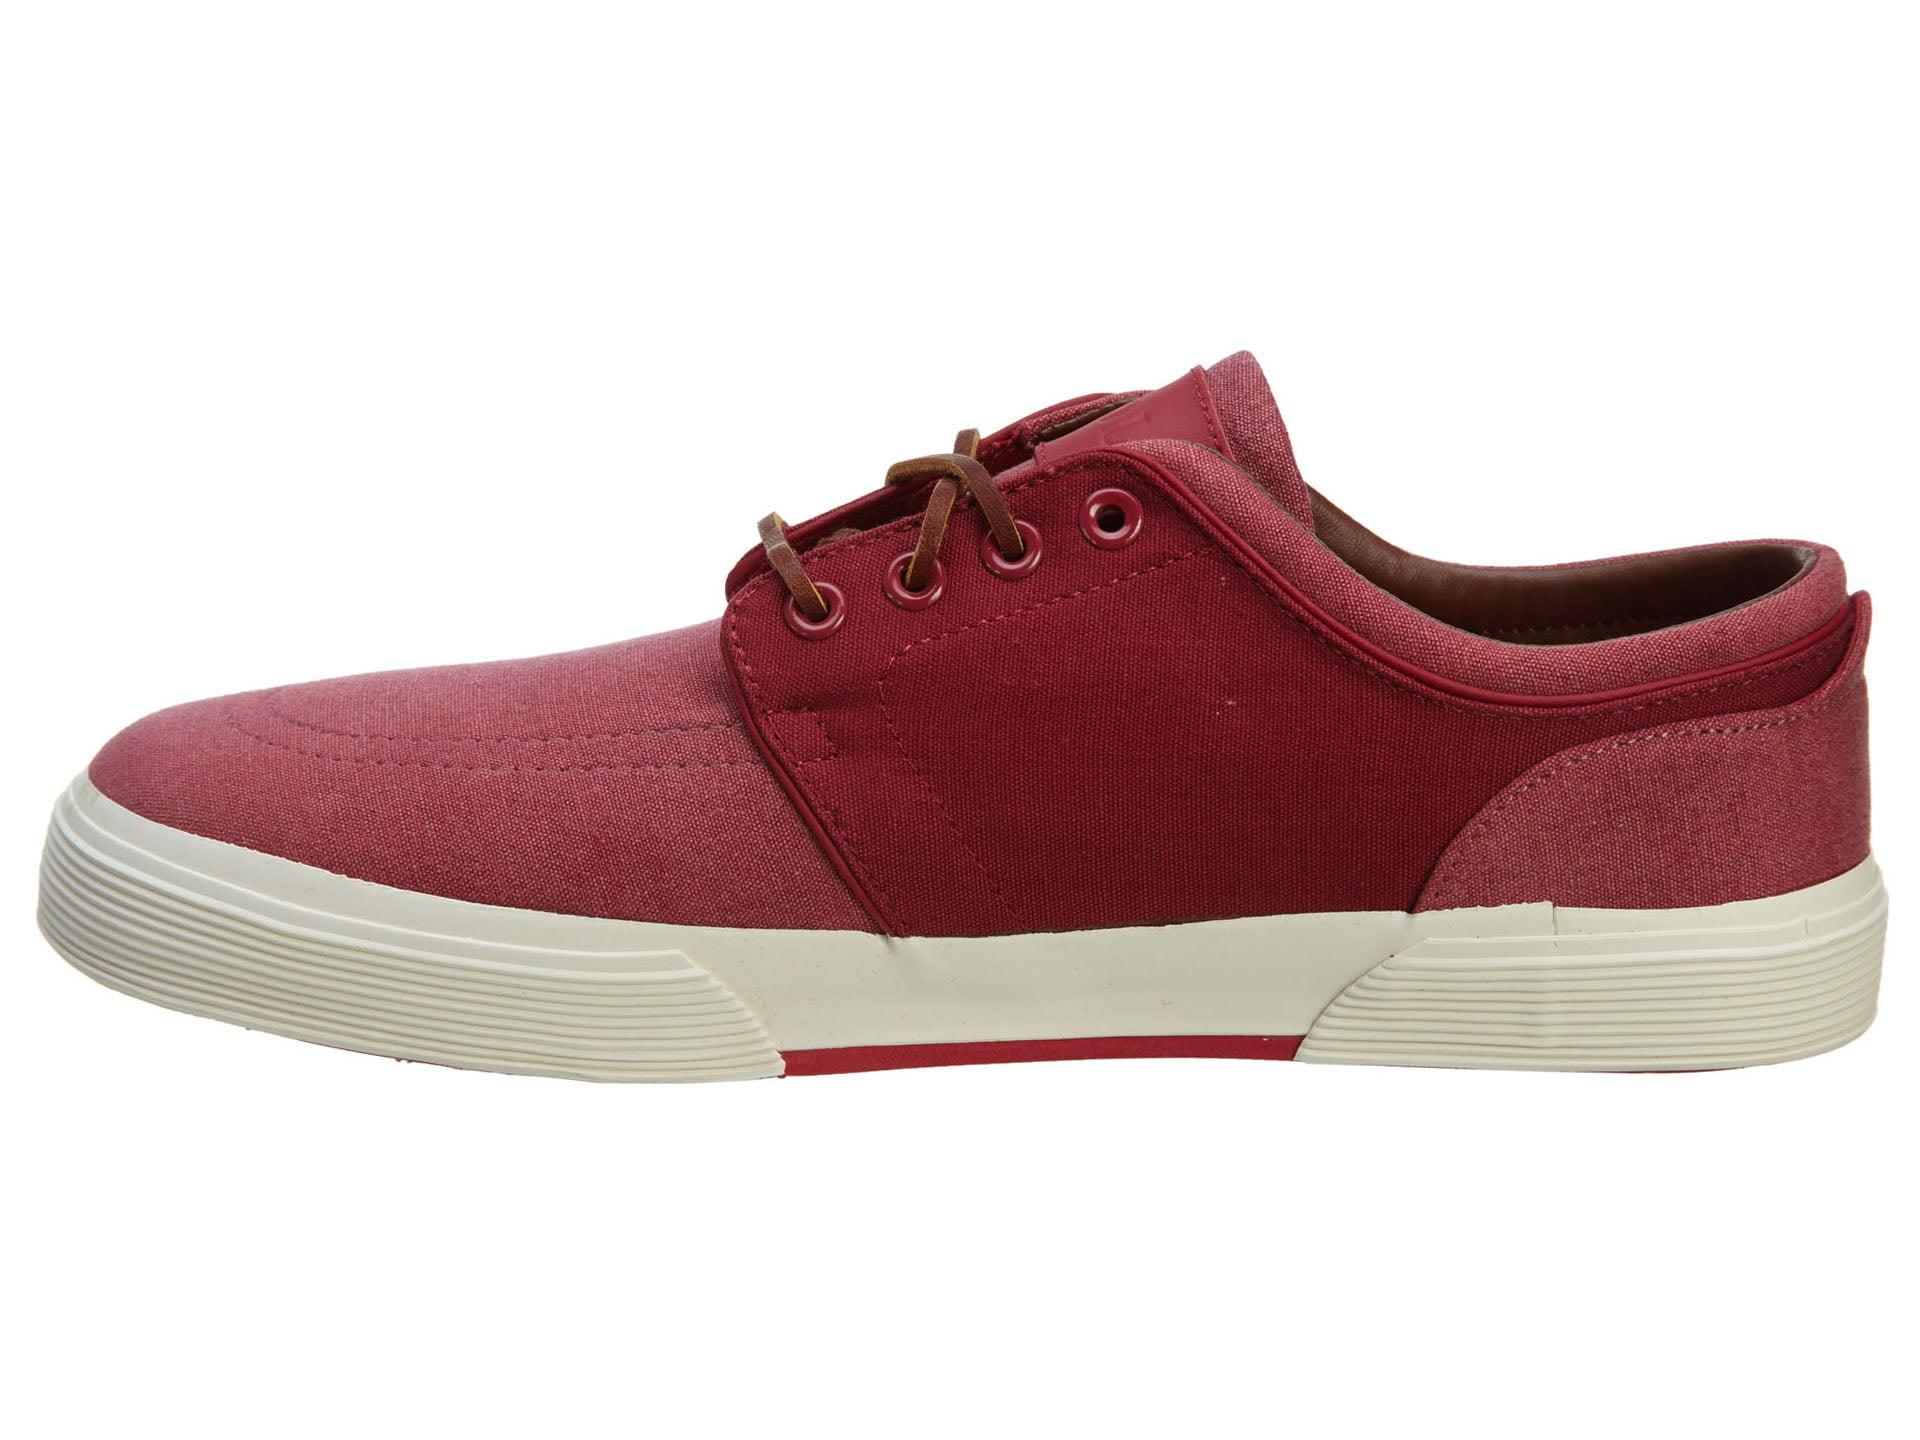 Polo Faxon Low Sneaker Mens Style : 816533932